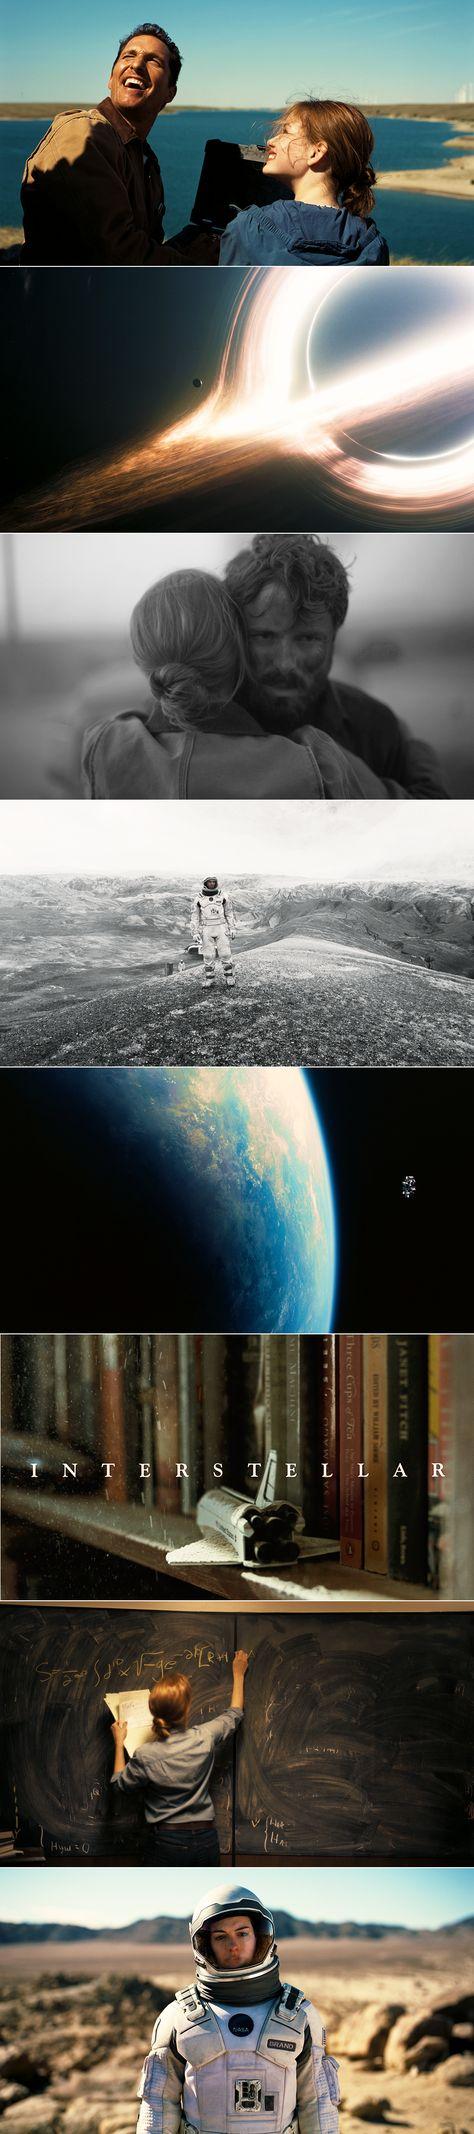 Interstellar Direct. by Christopher Nolan; Cinematography by Hoyte Van Hoytema. One of Nolan's best